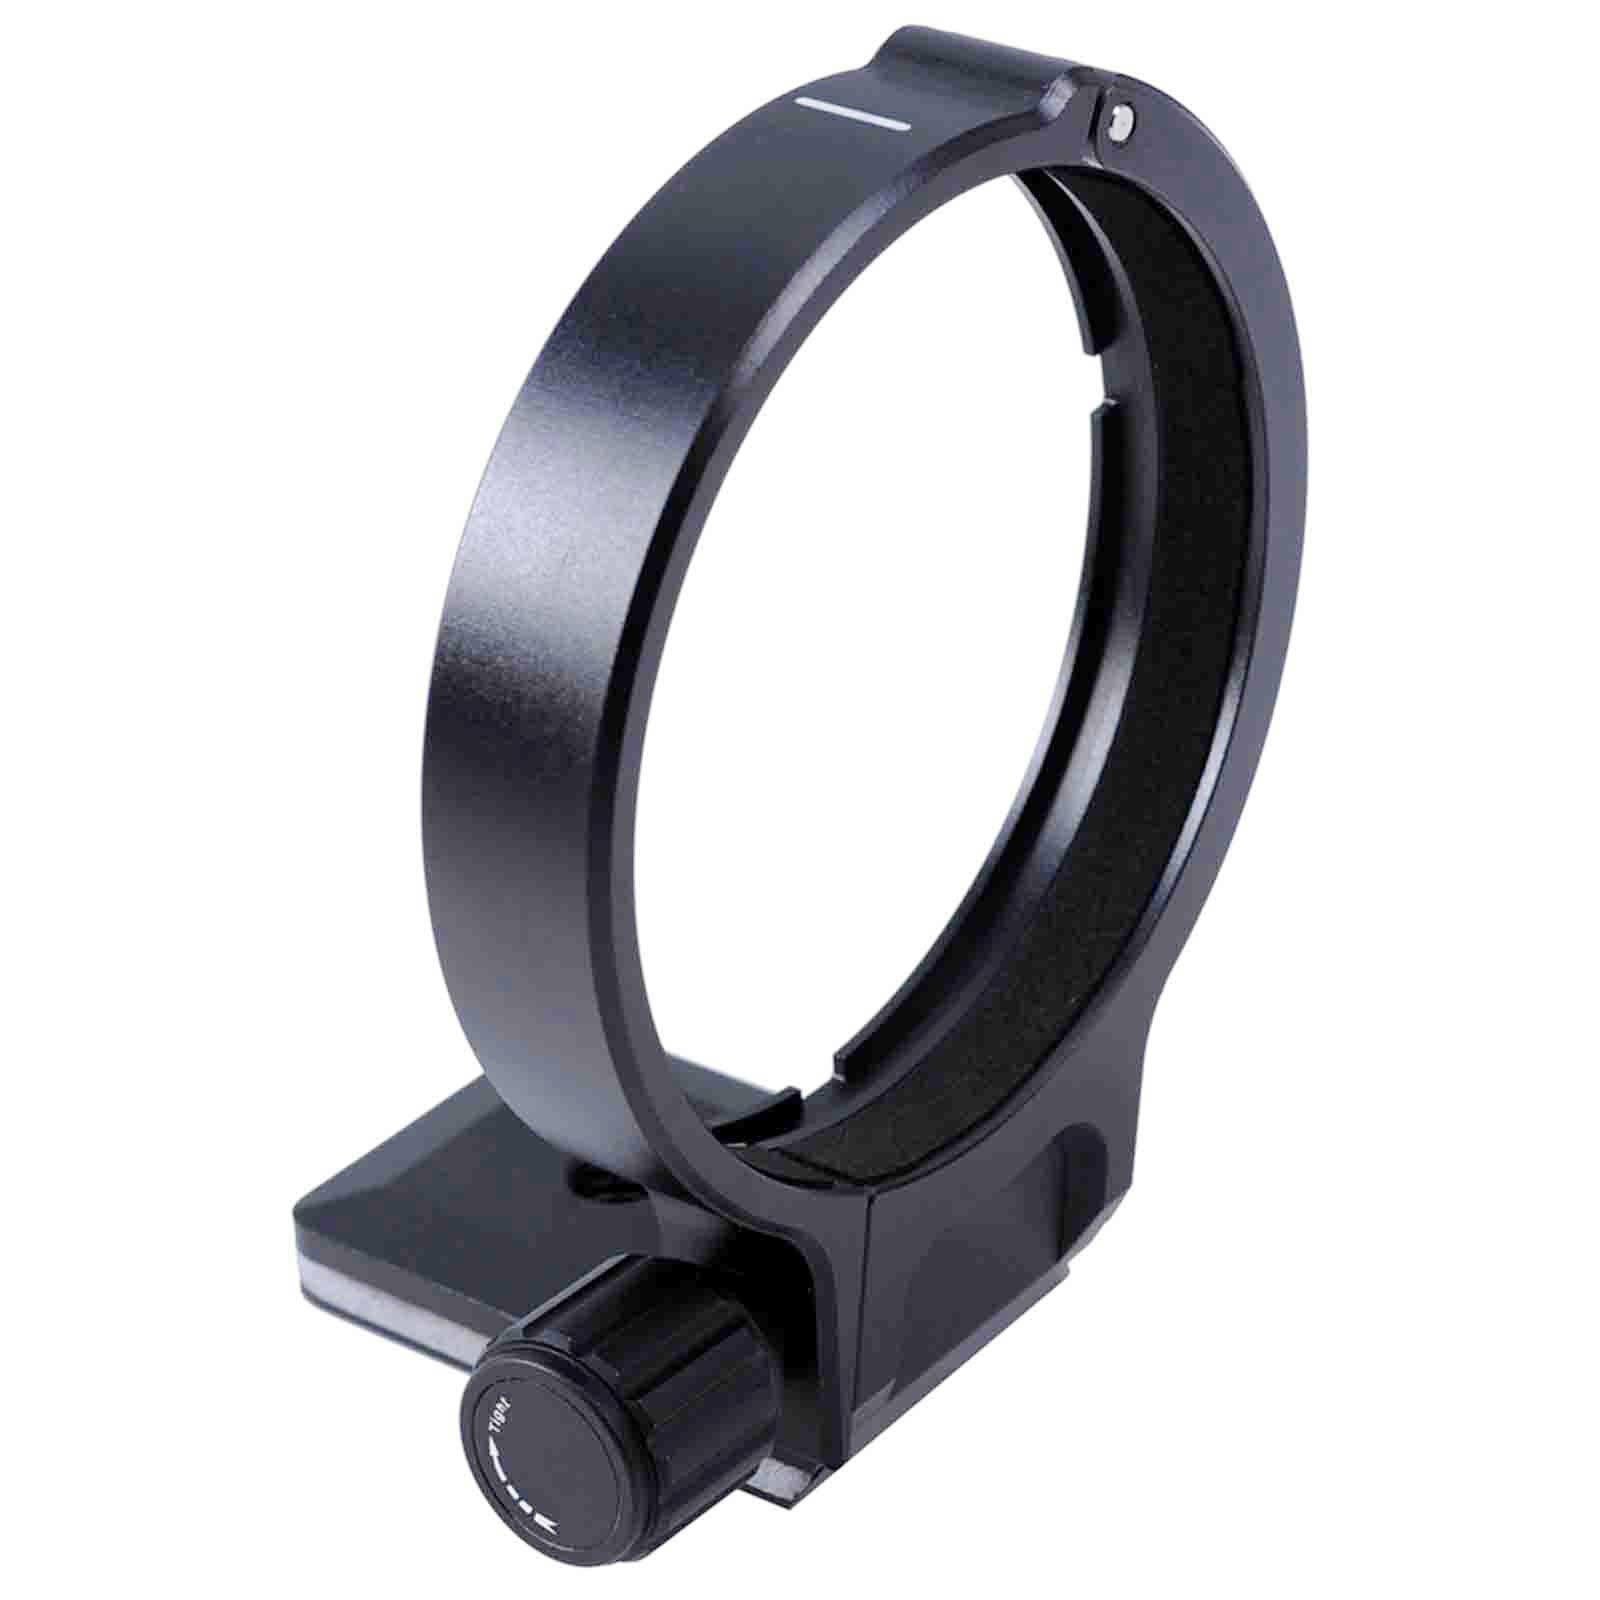 Lens Collar Tripod Mount Ring for Canon MP-E 65mm f/2.8 1-5x Macro Photo Lens